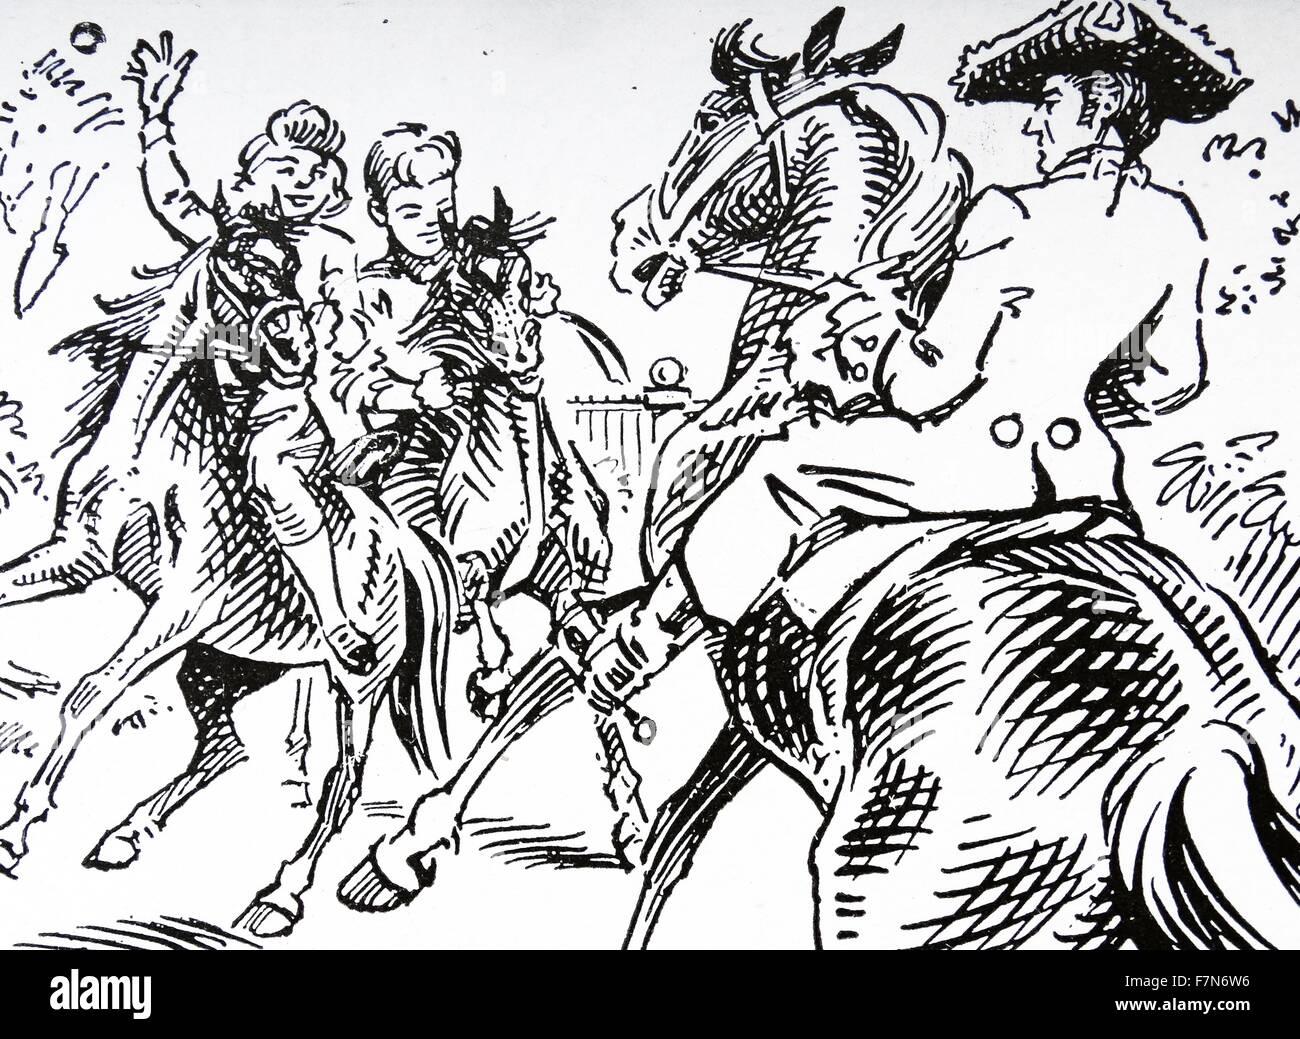 18th century highwayman and victim - Stock Image